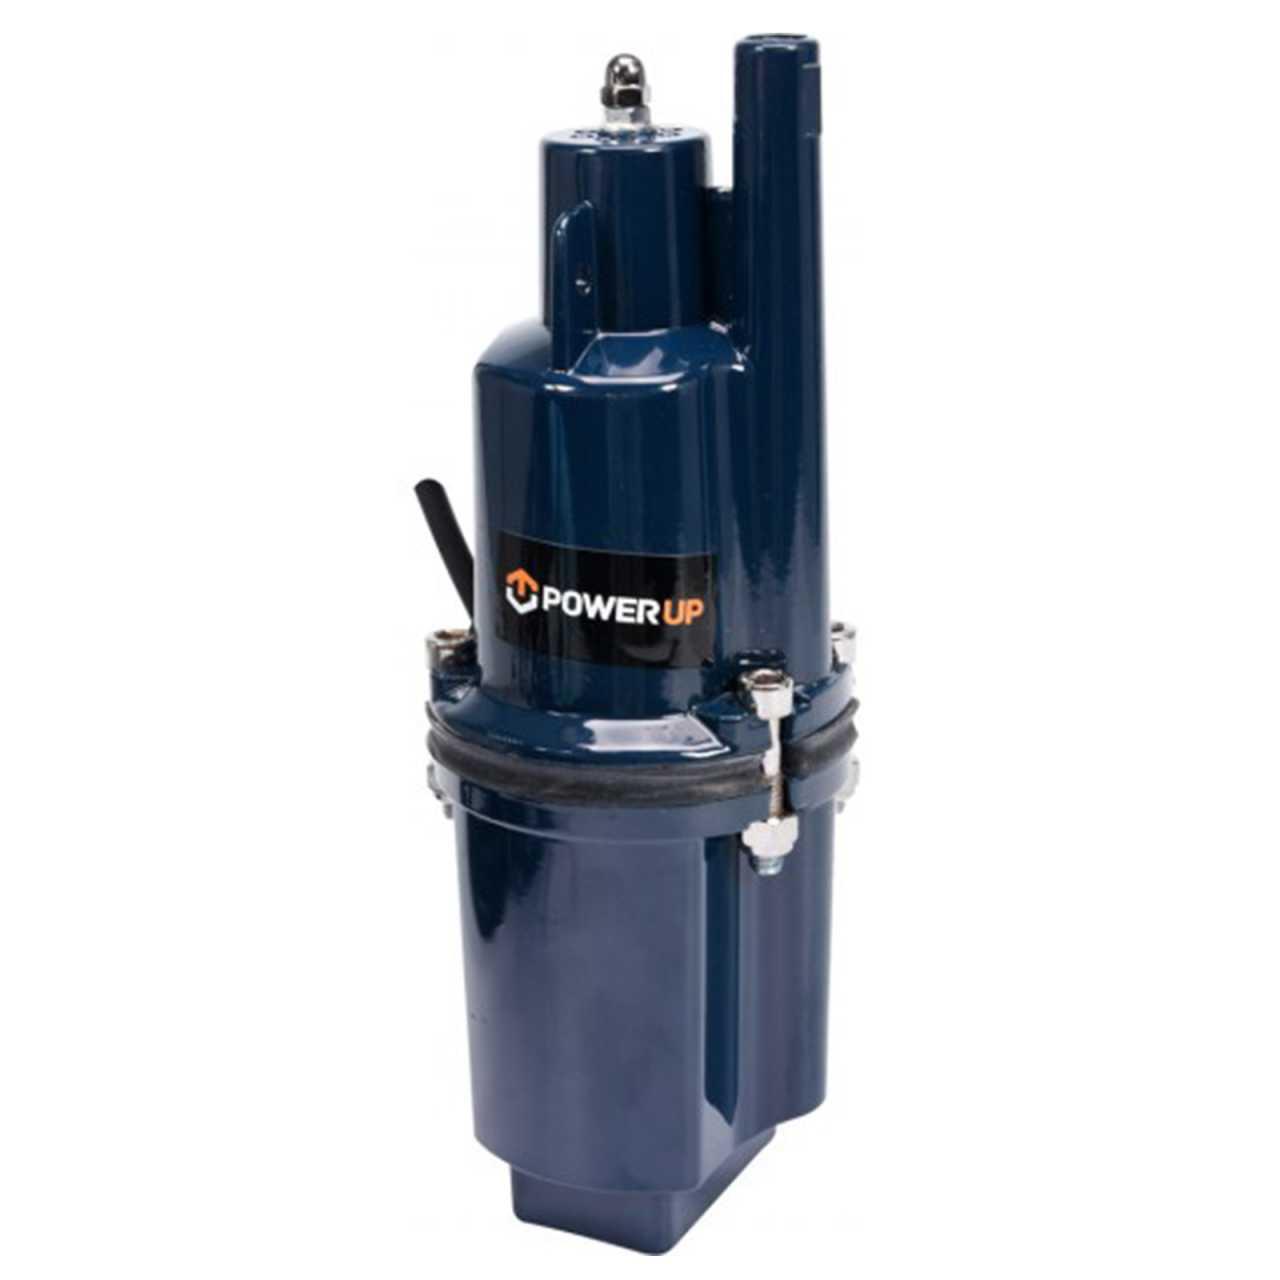 PowerUP Membran Pumpe 280 Watt / 1050l 79942